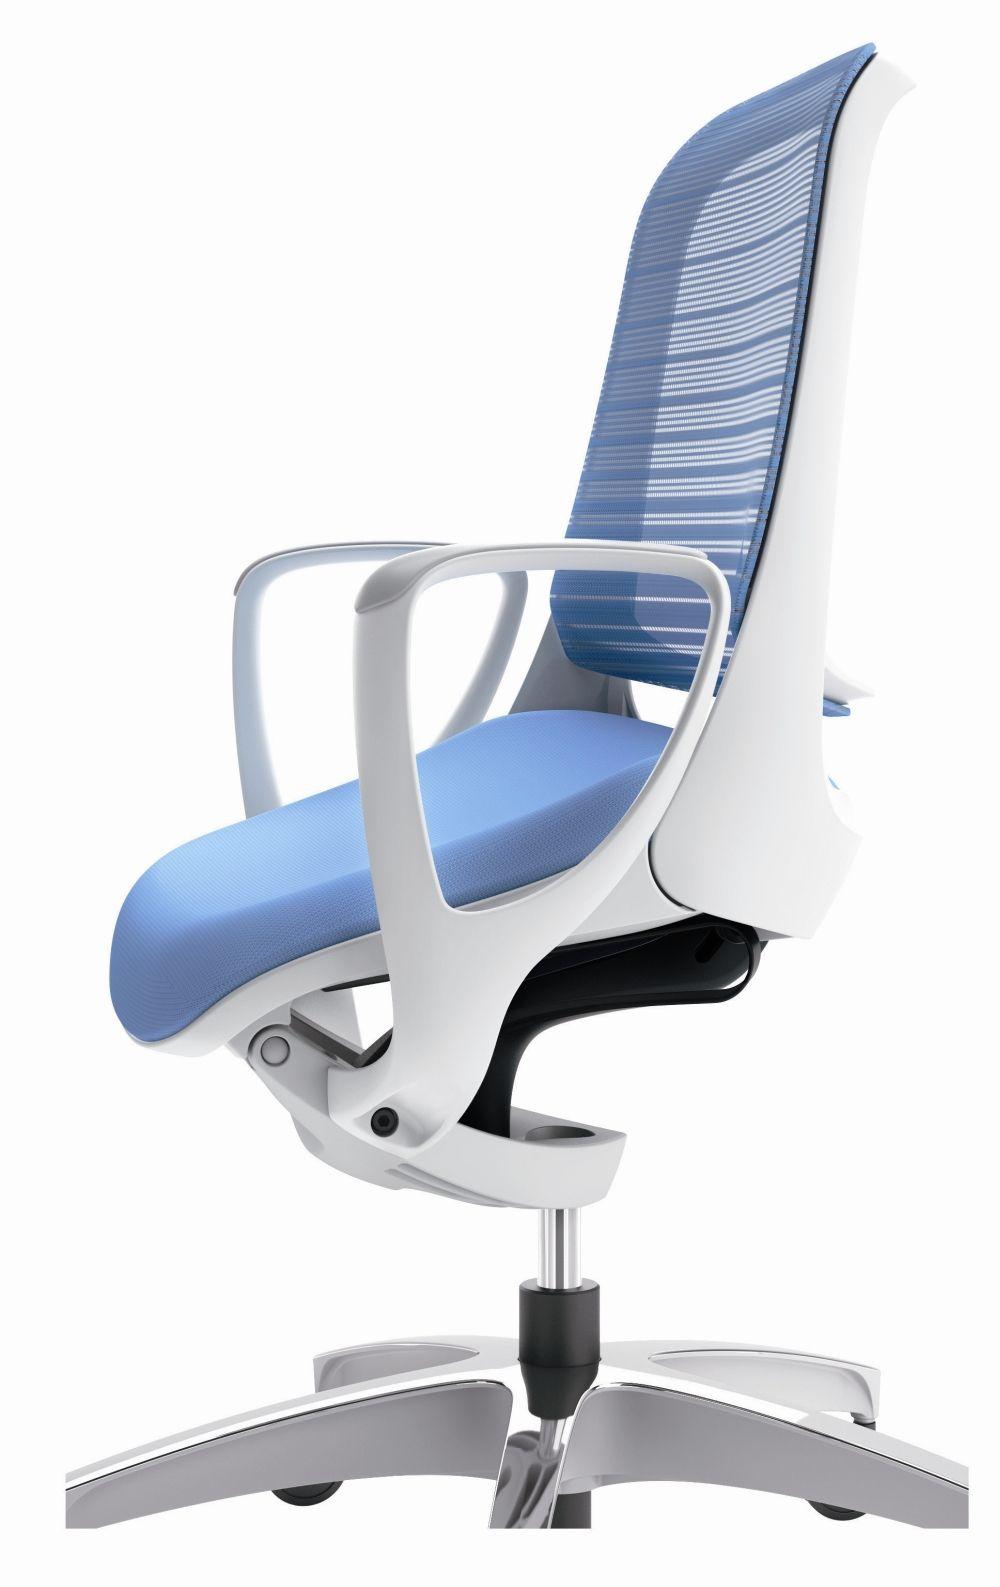 Pin By Maroc Bureau On Sieges De Direction De Travail Interior Design Furniture Furniture Design Office Chair